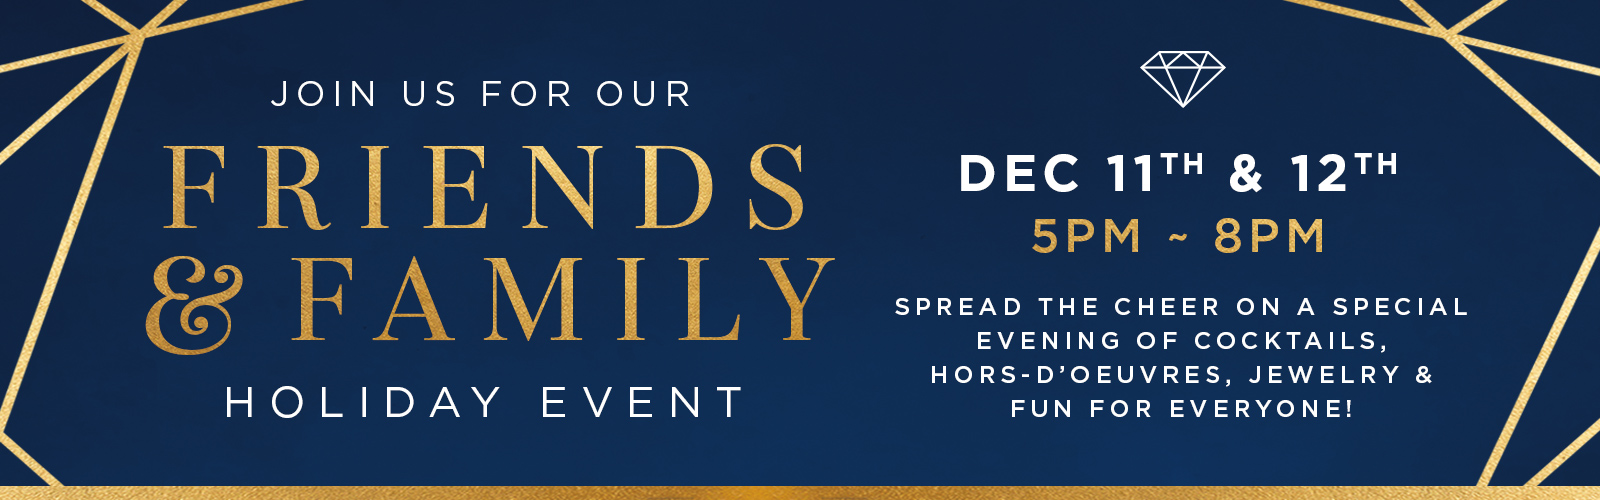 Bentley Diamond - Friends & Family Event